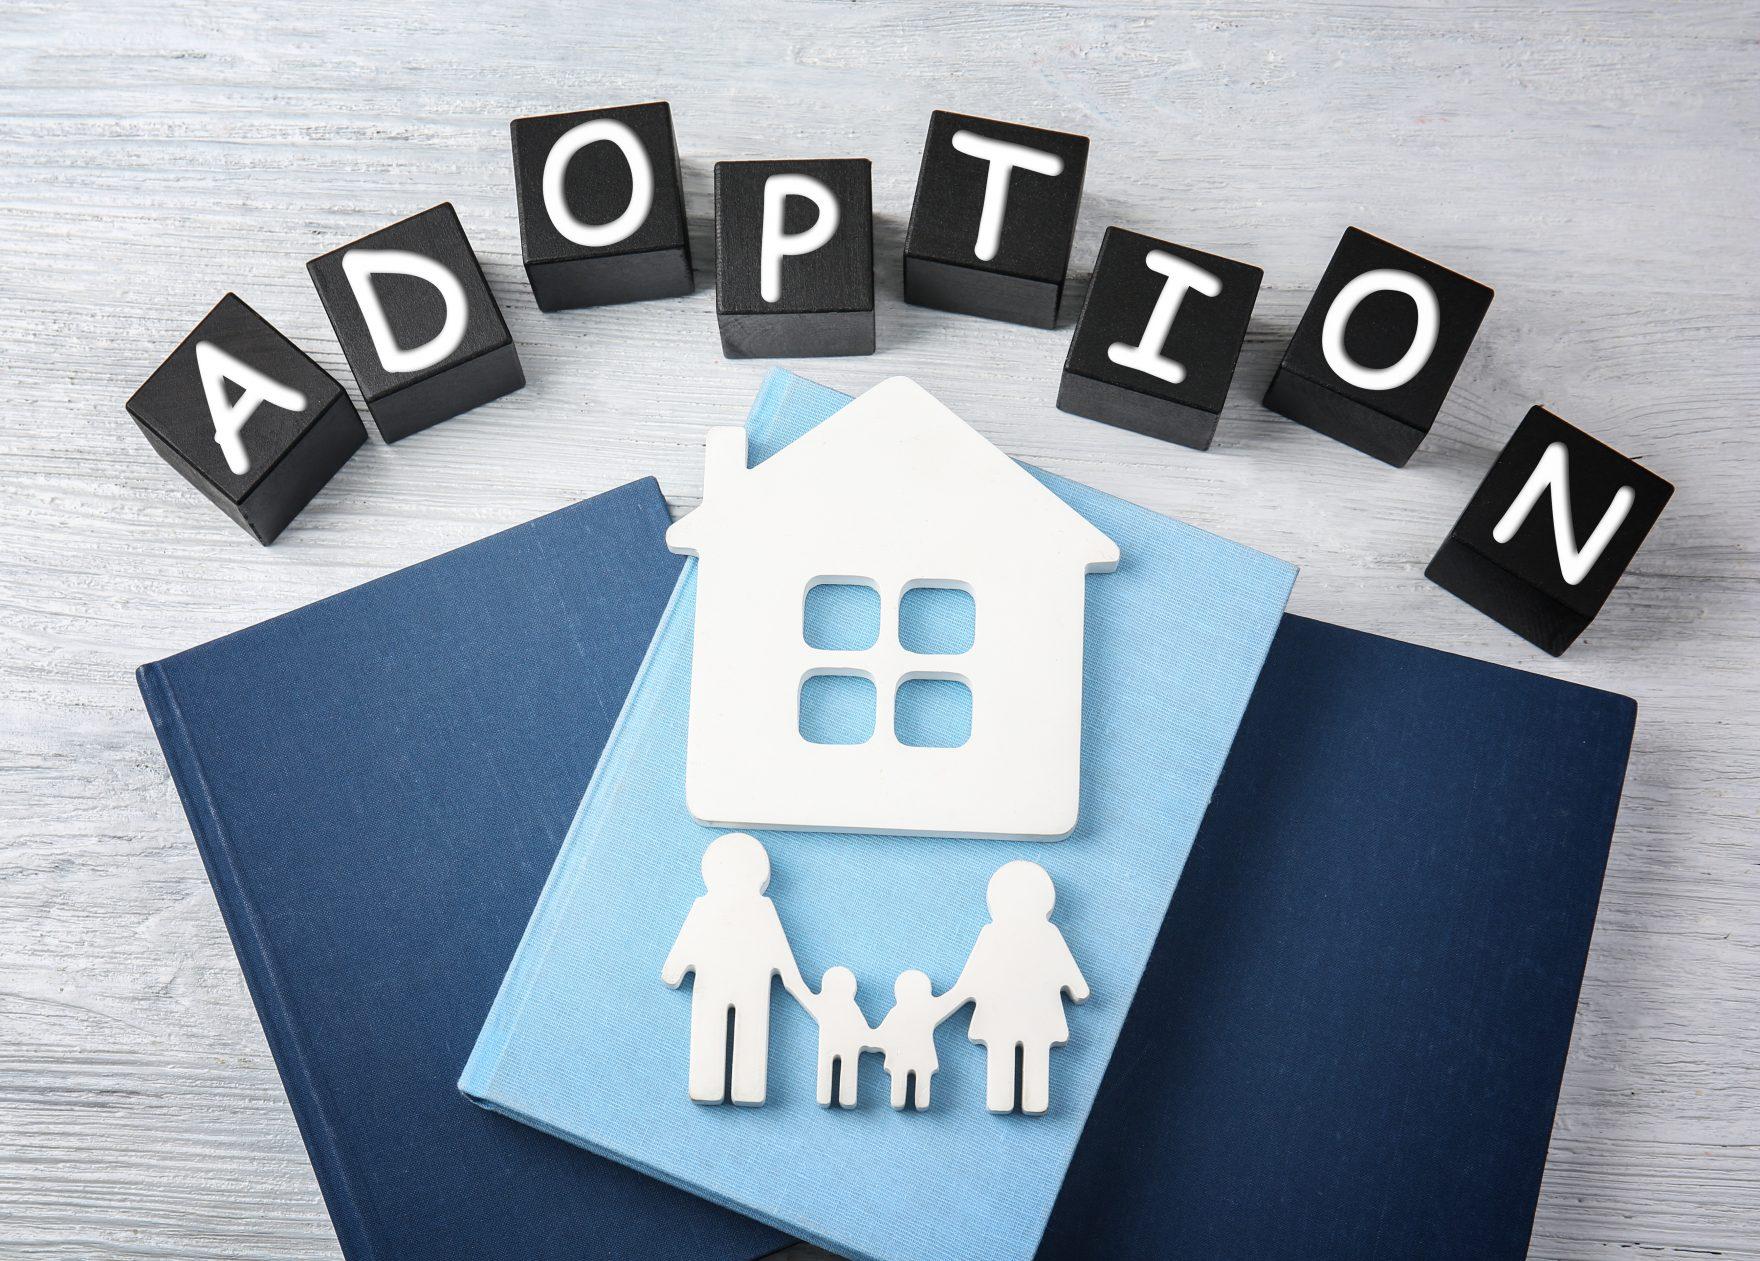 adoption centers near me